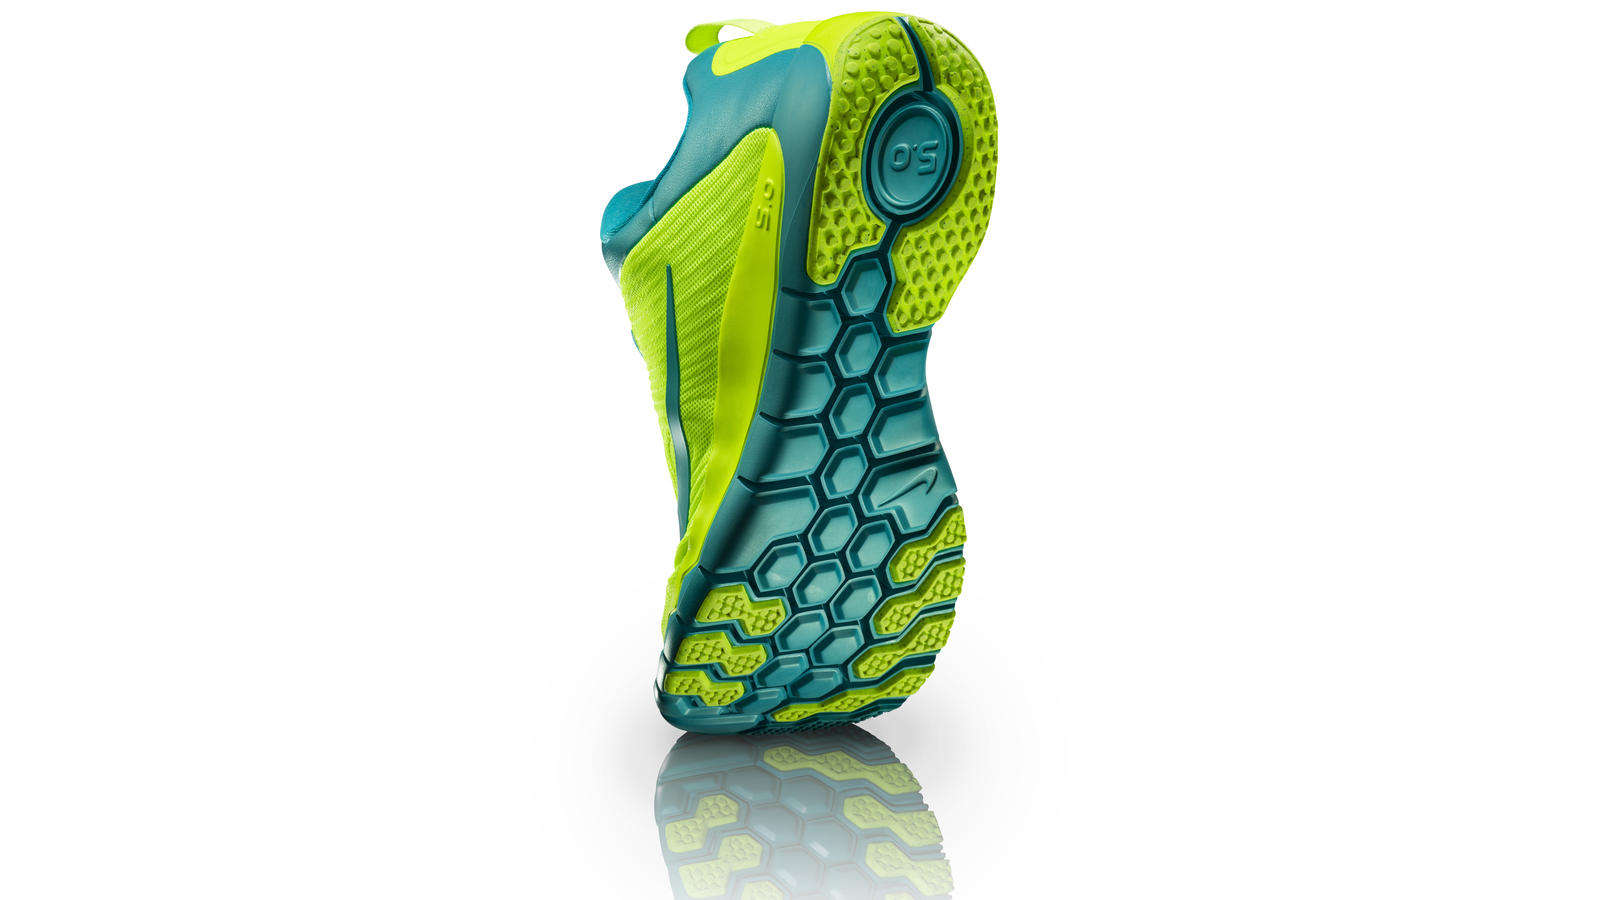 separation shoes b8b7d 3649f nikefreetrainer5-0flex